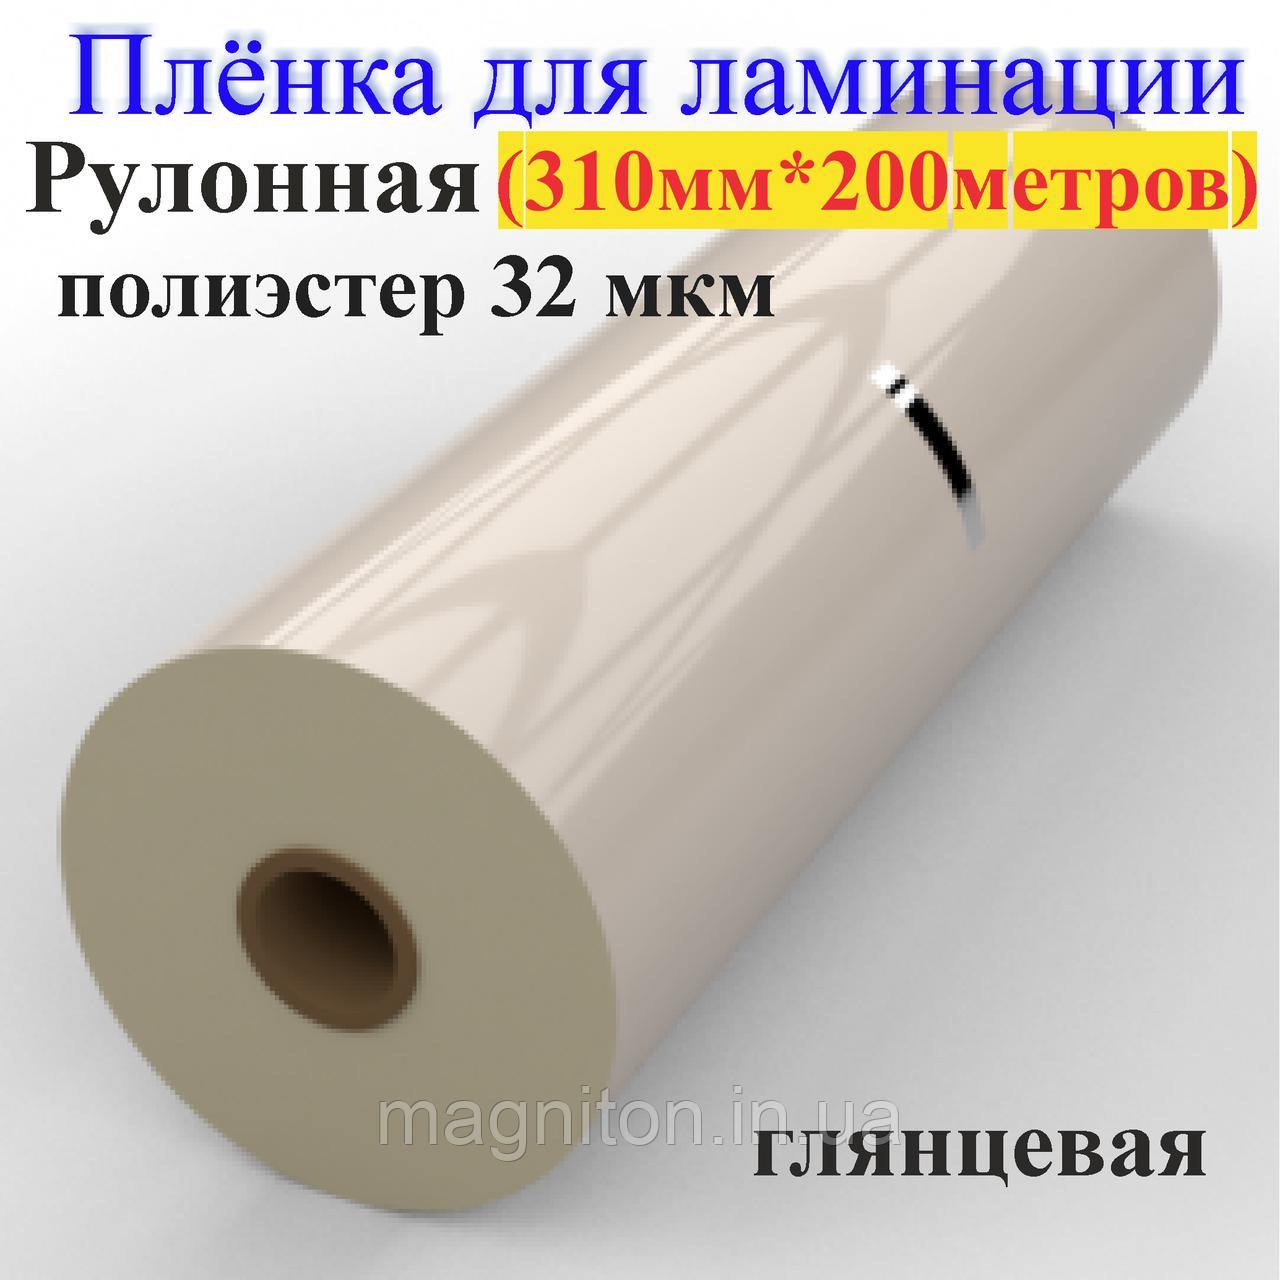 Ламинация Рулонная 310мм х 200 метров  32 мкм глянец полиэстер